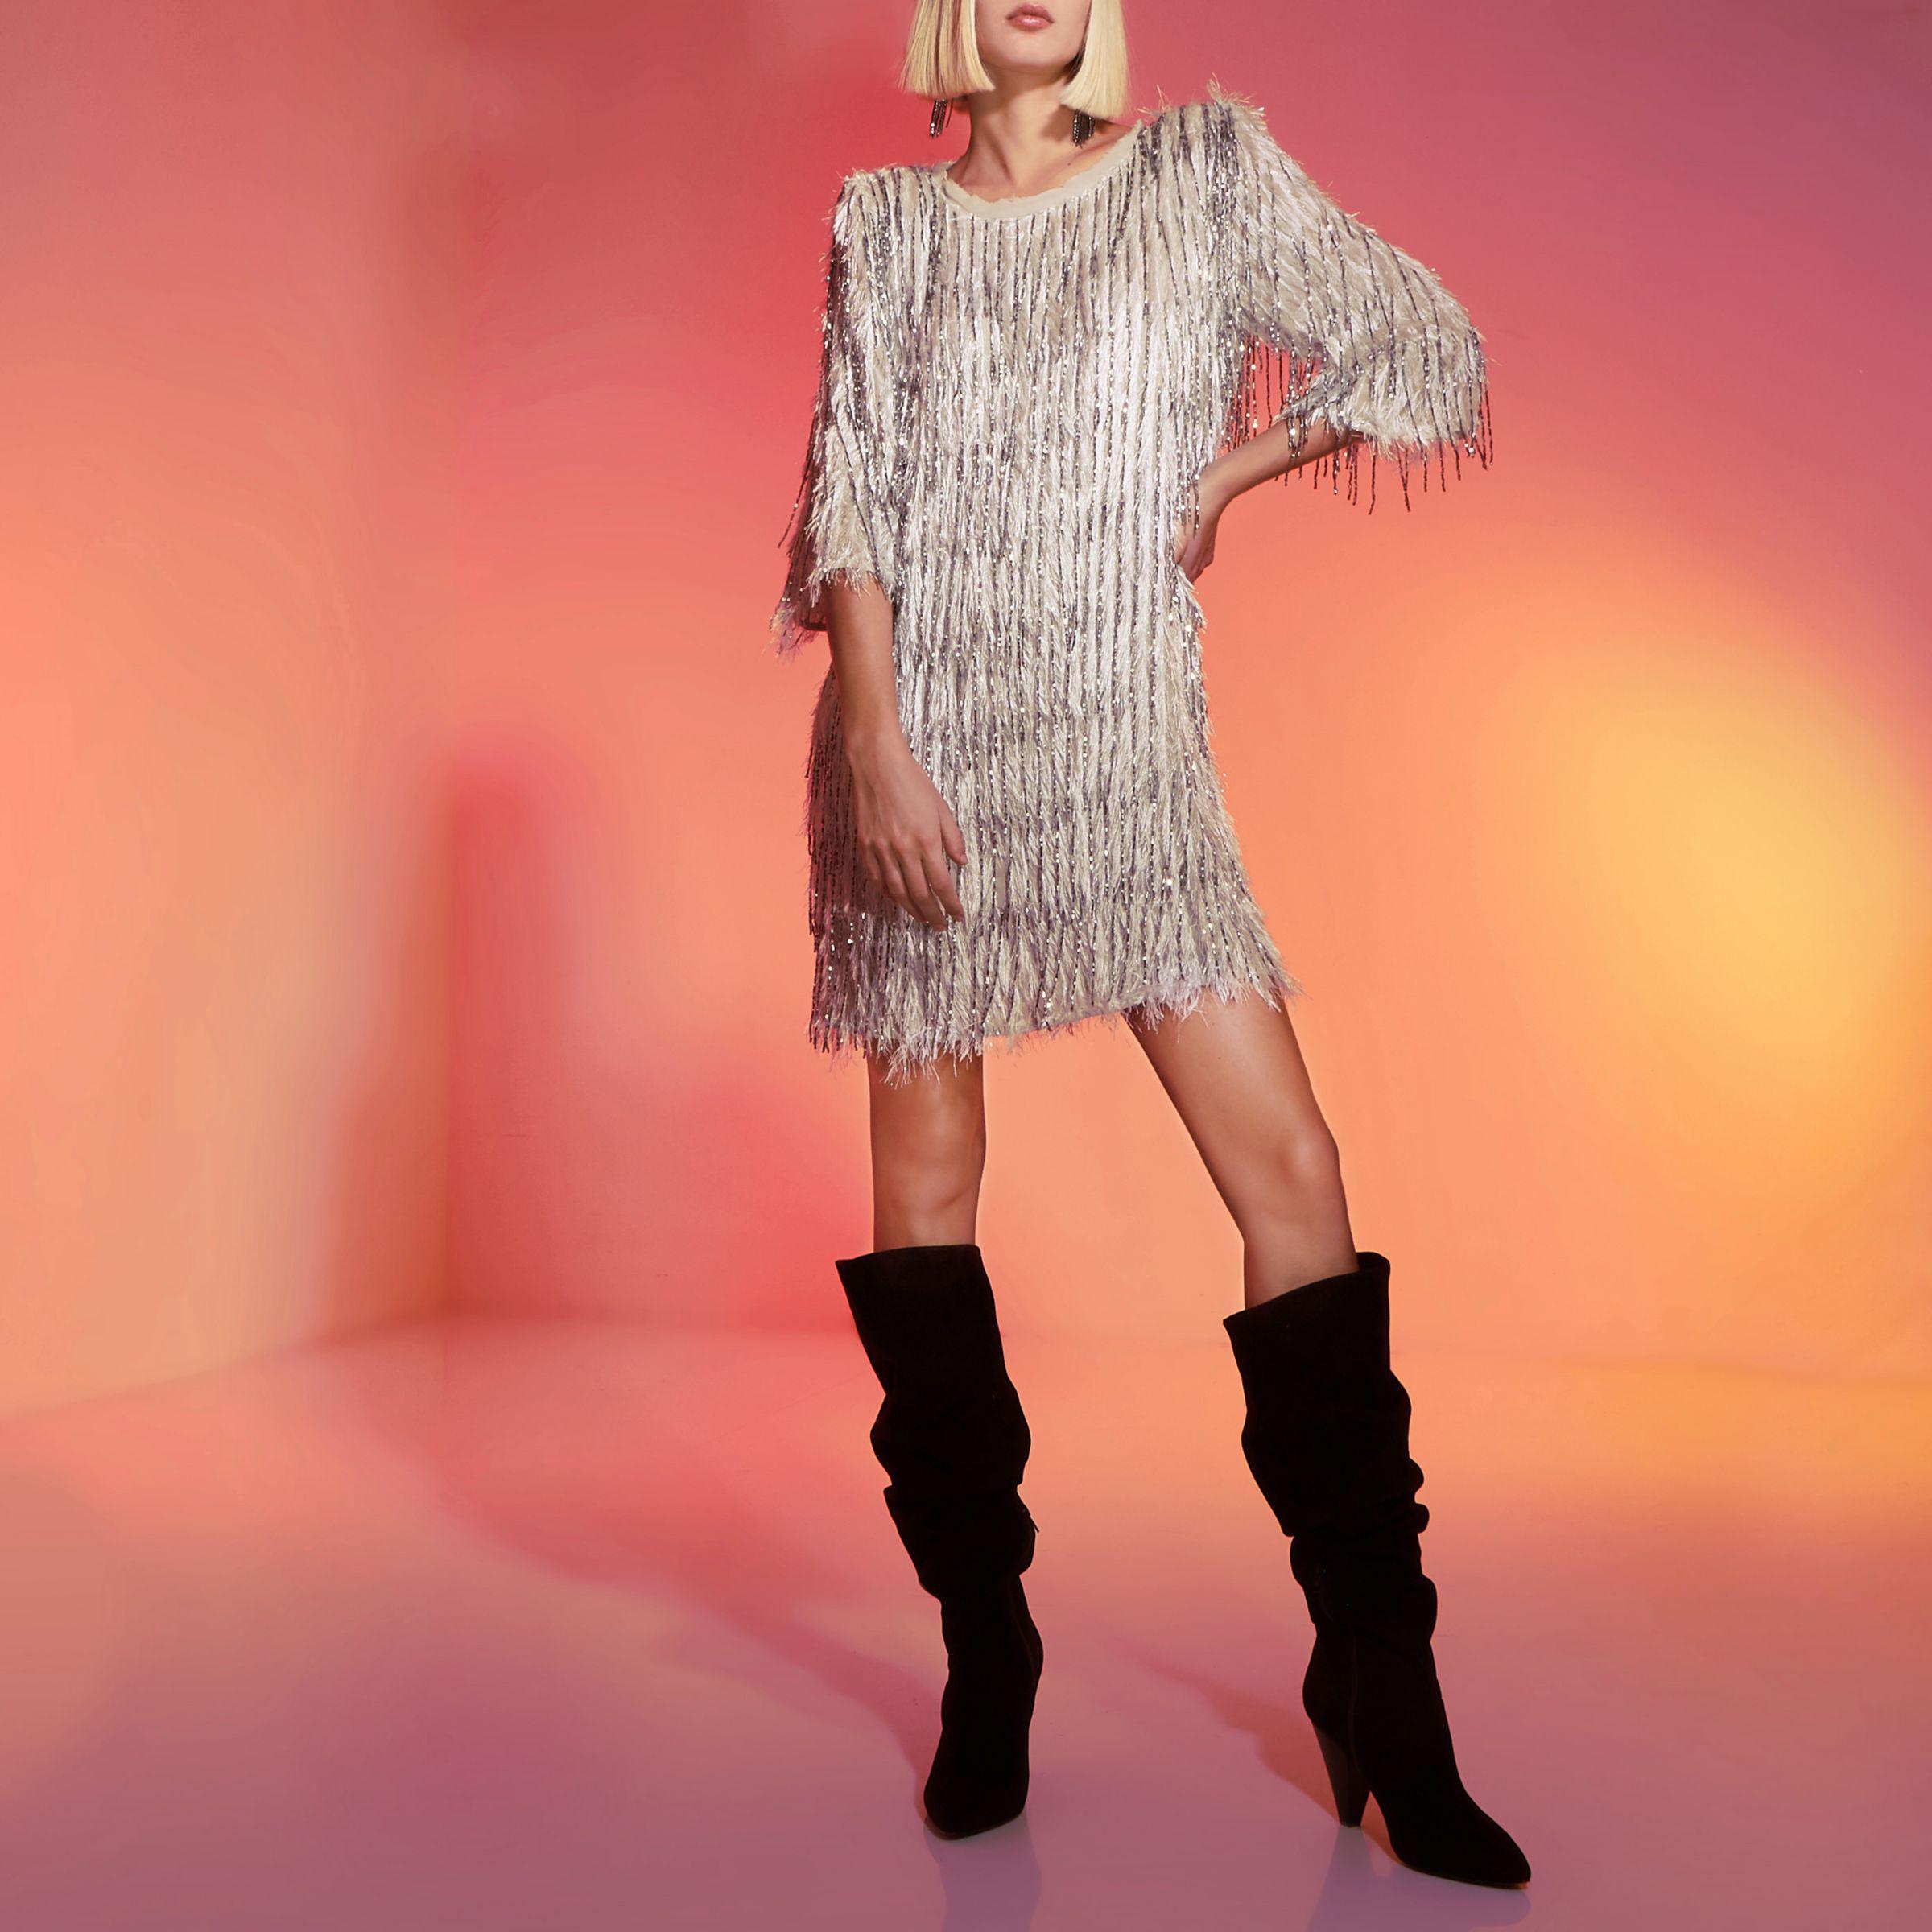 986ece111a River Island Light Grey Ri Studio Embellished Shift Dress in Gray - Lyst